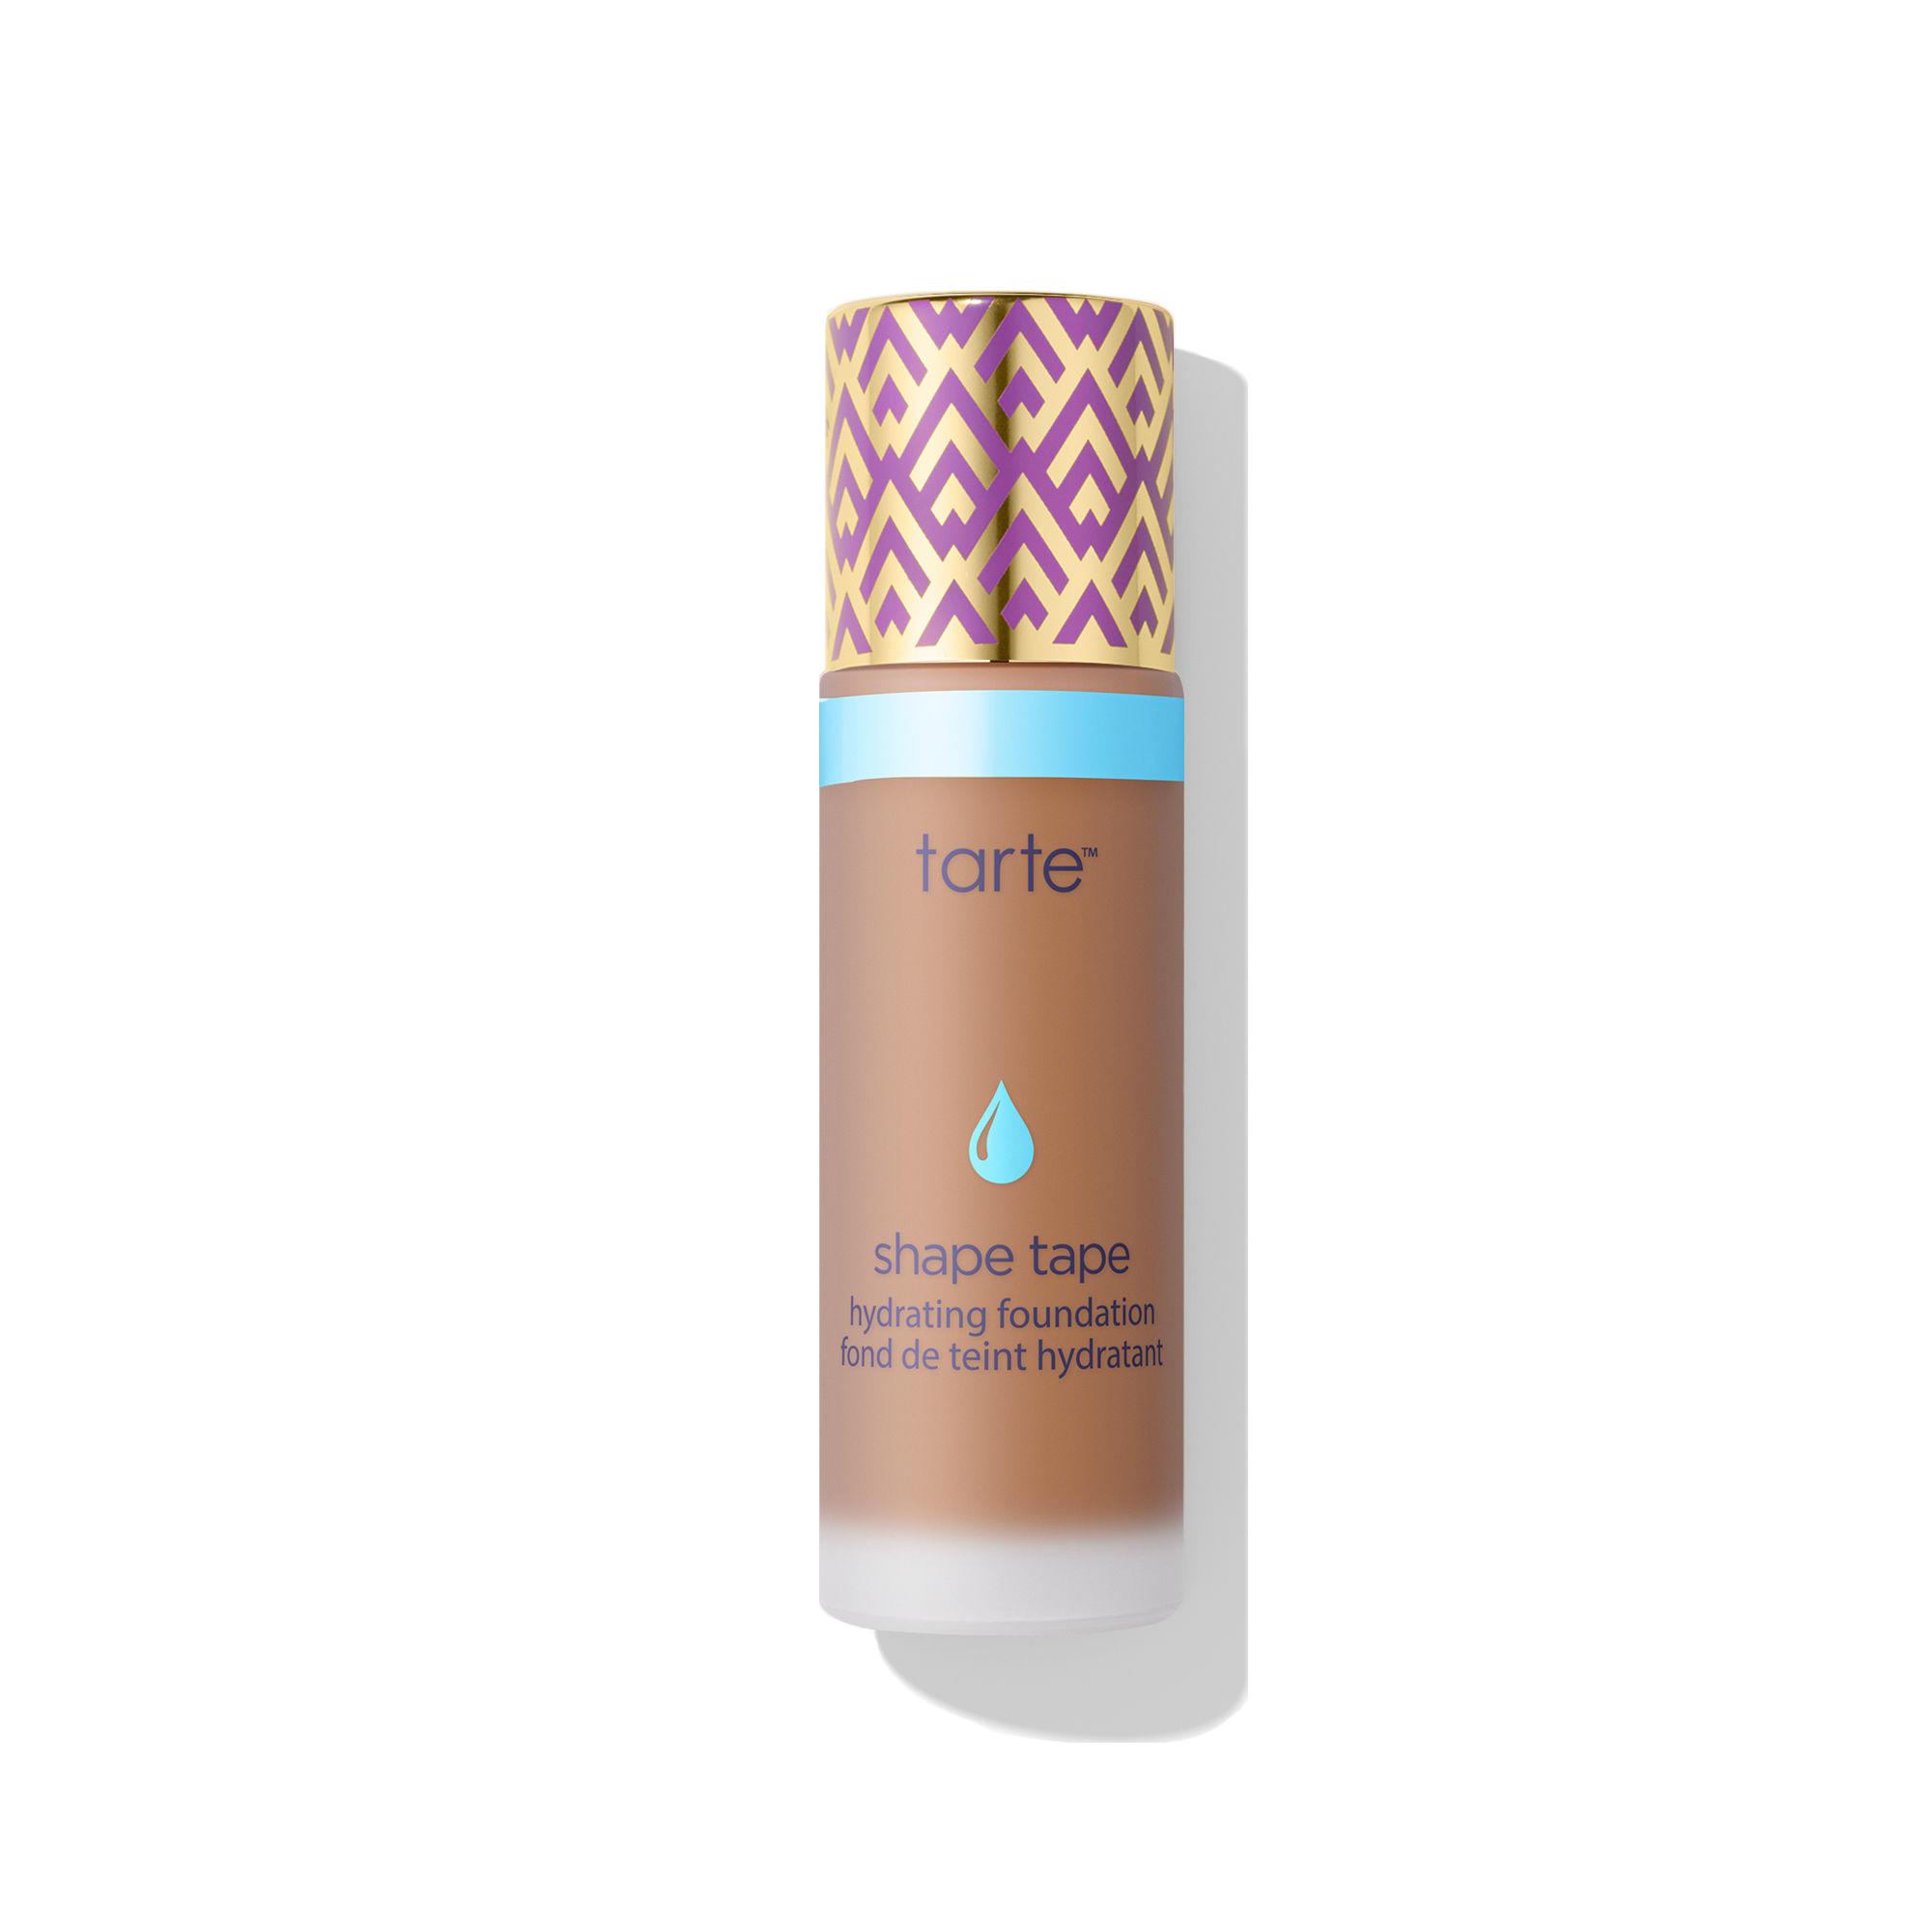 Tarte Shape Tape Hydrating Foundation Deep Golden